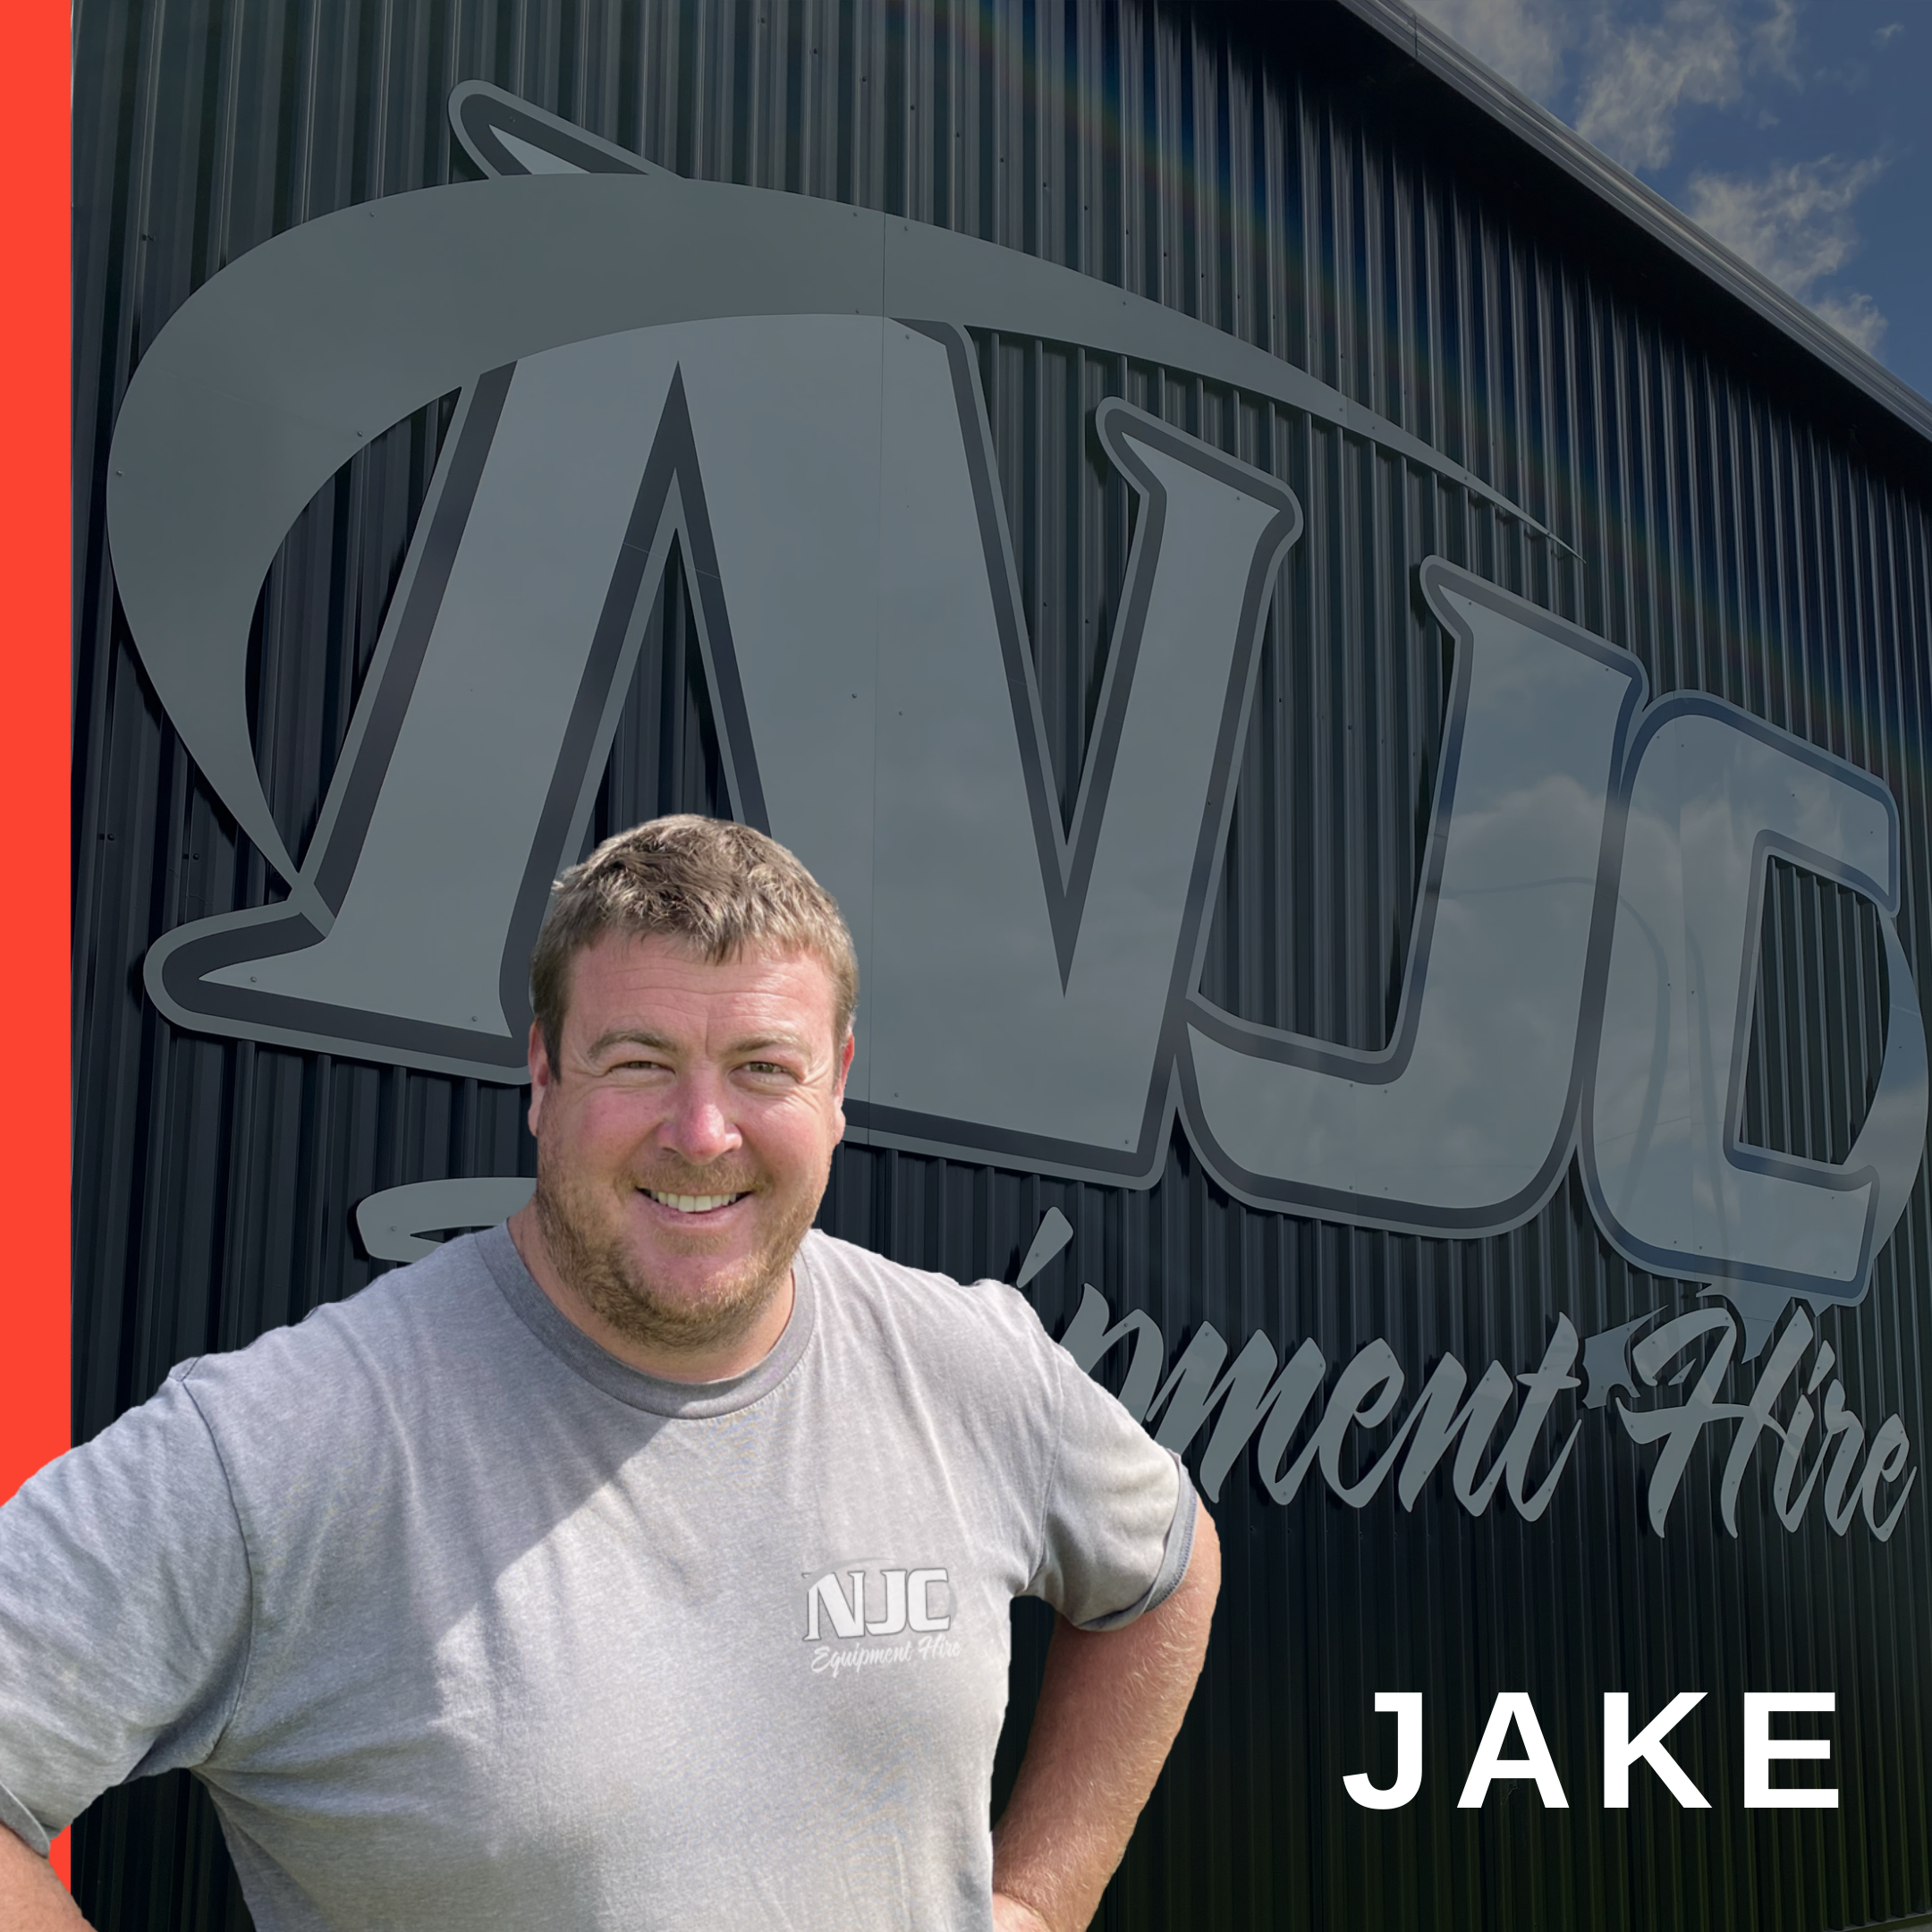 Jake Curran NJC